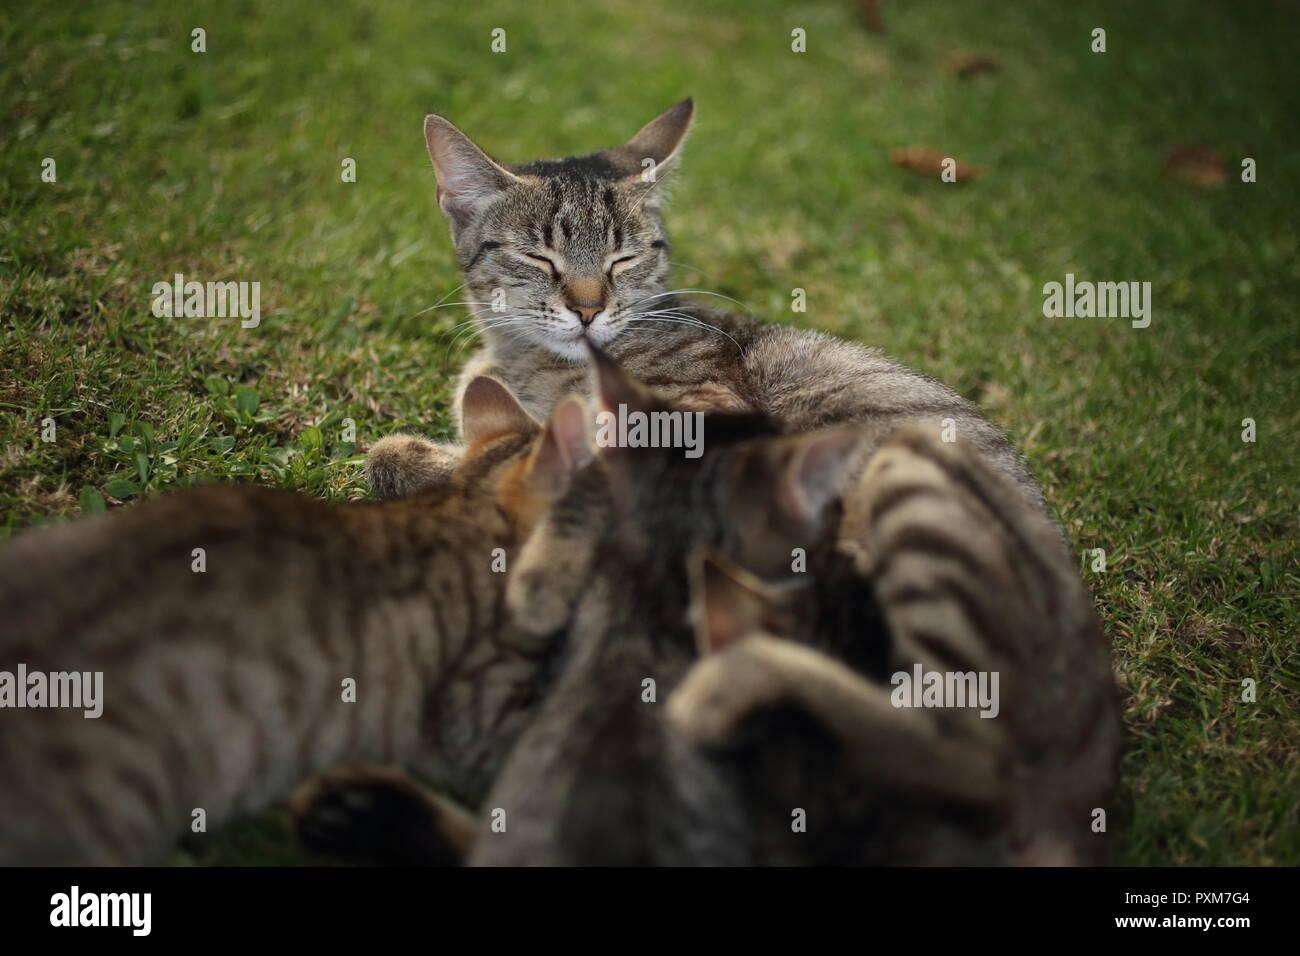 Mother cat nurses tabby kittens outdoors in the garden - Stock Image